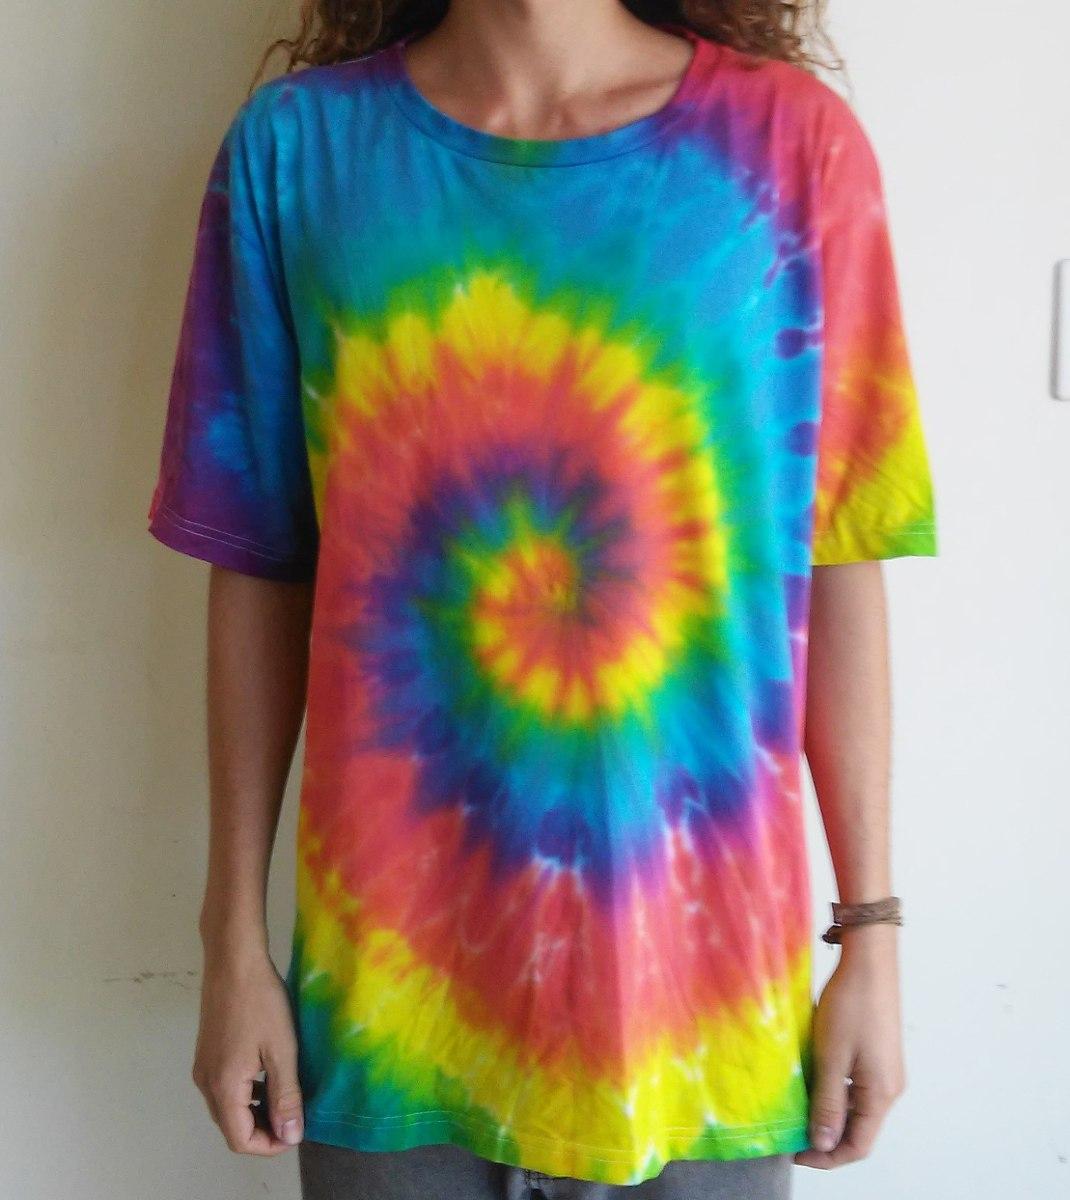 Camiseta tie dye espiral psicodelica groovy arte exg r for Camisetas hippies caseras